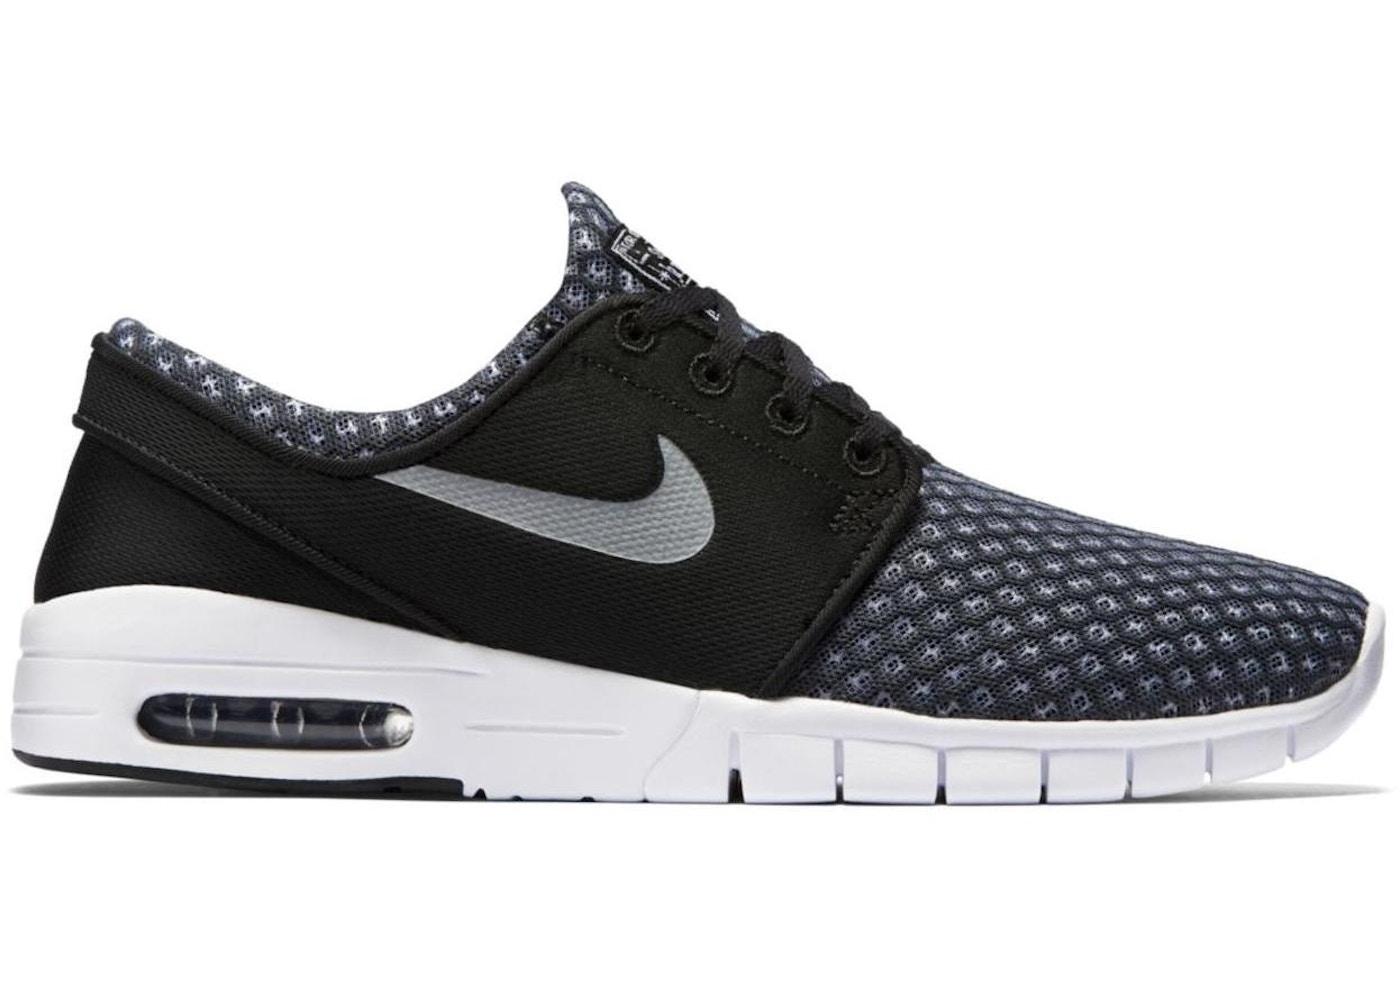 ade567235f Sell. or Ask. Size: 10.5. View All Bids. Nike SB Stefan Janoski Max  Metallic Grey